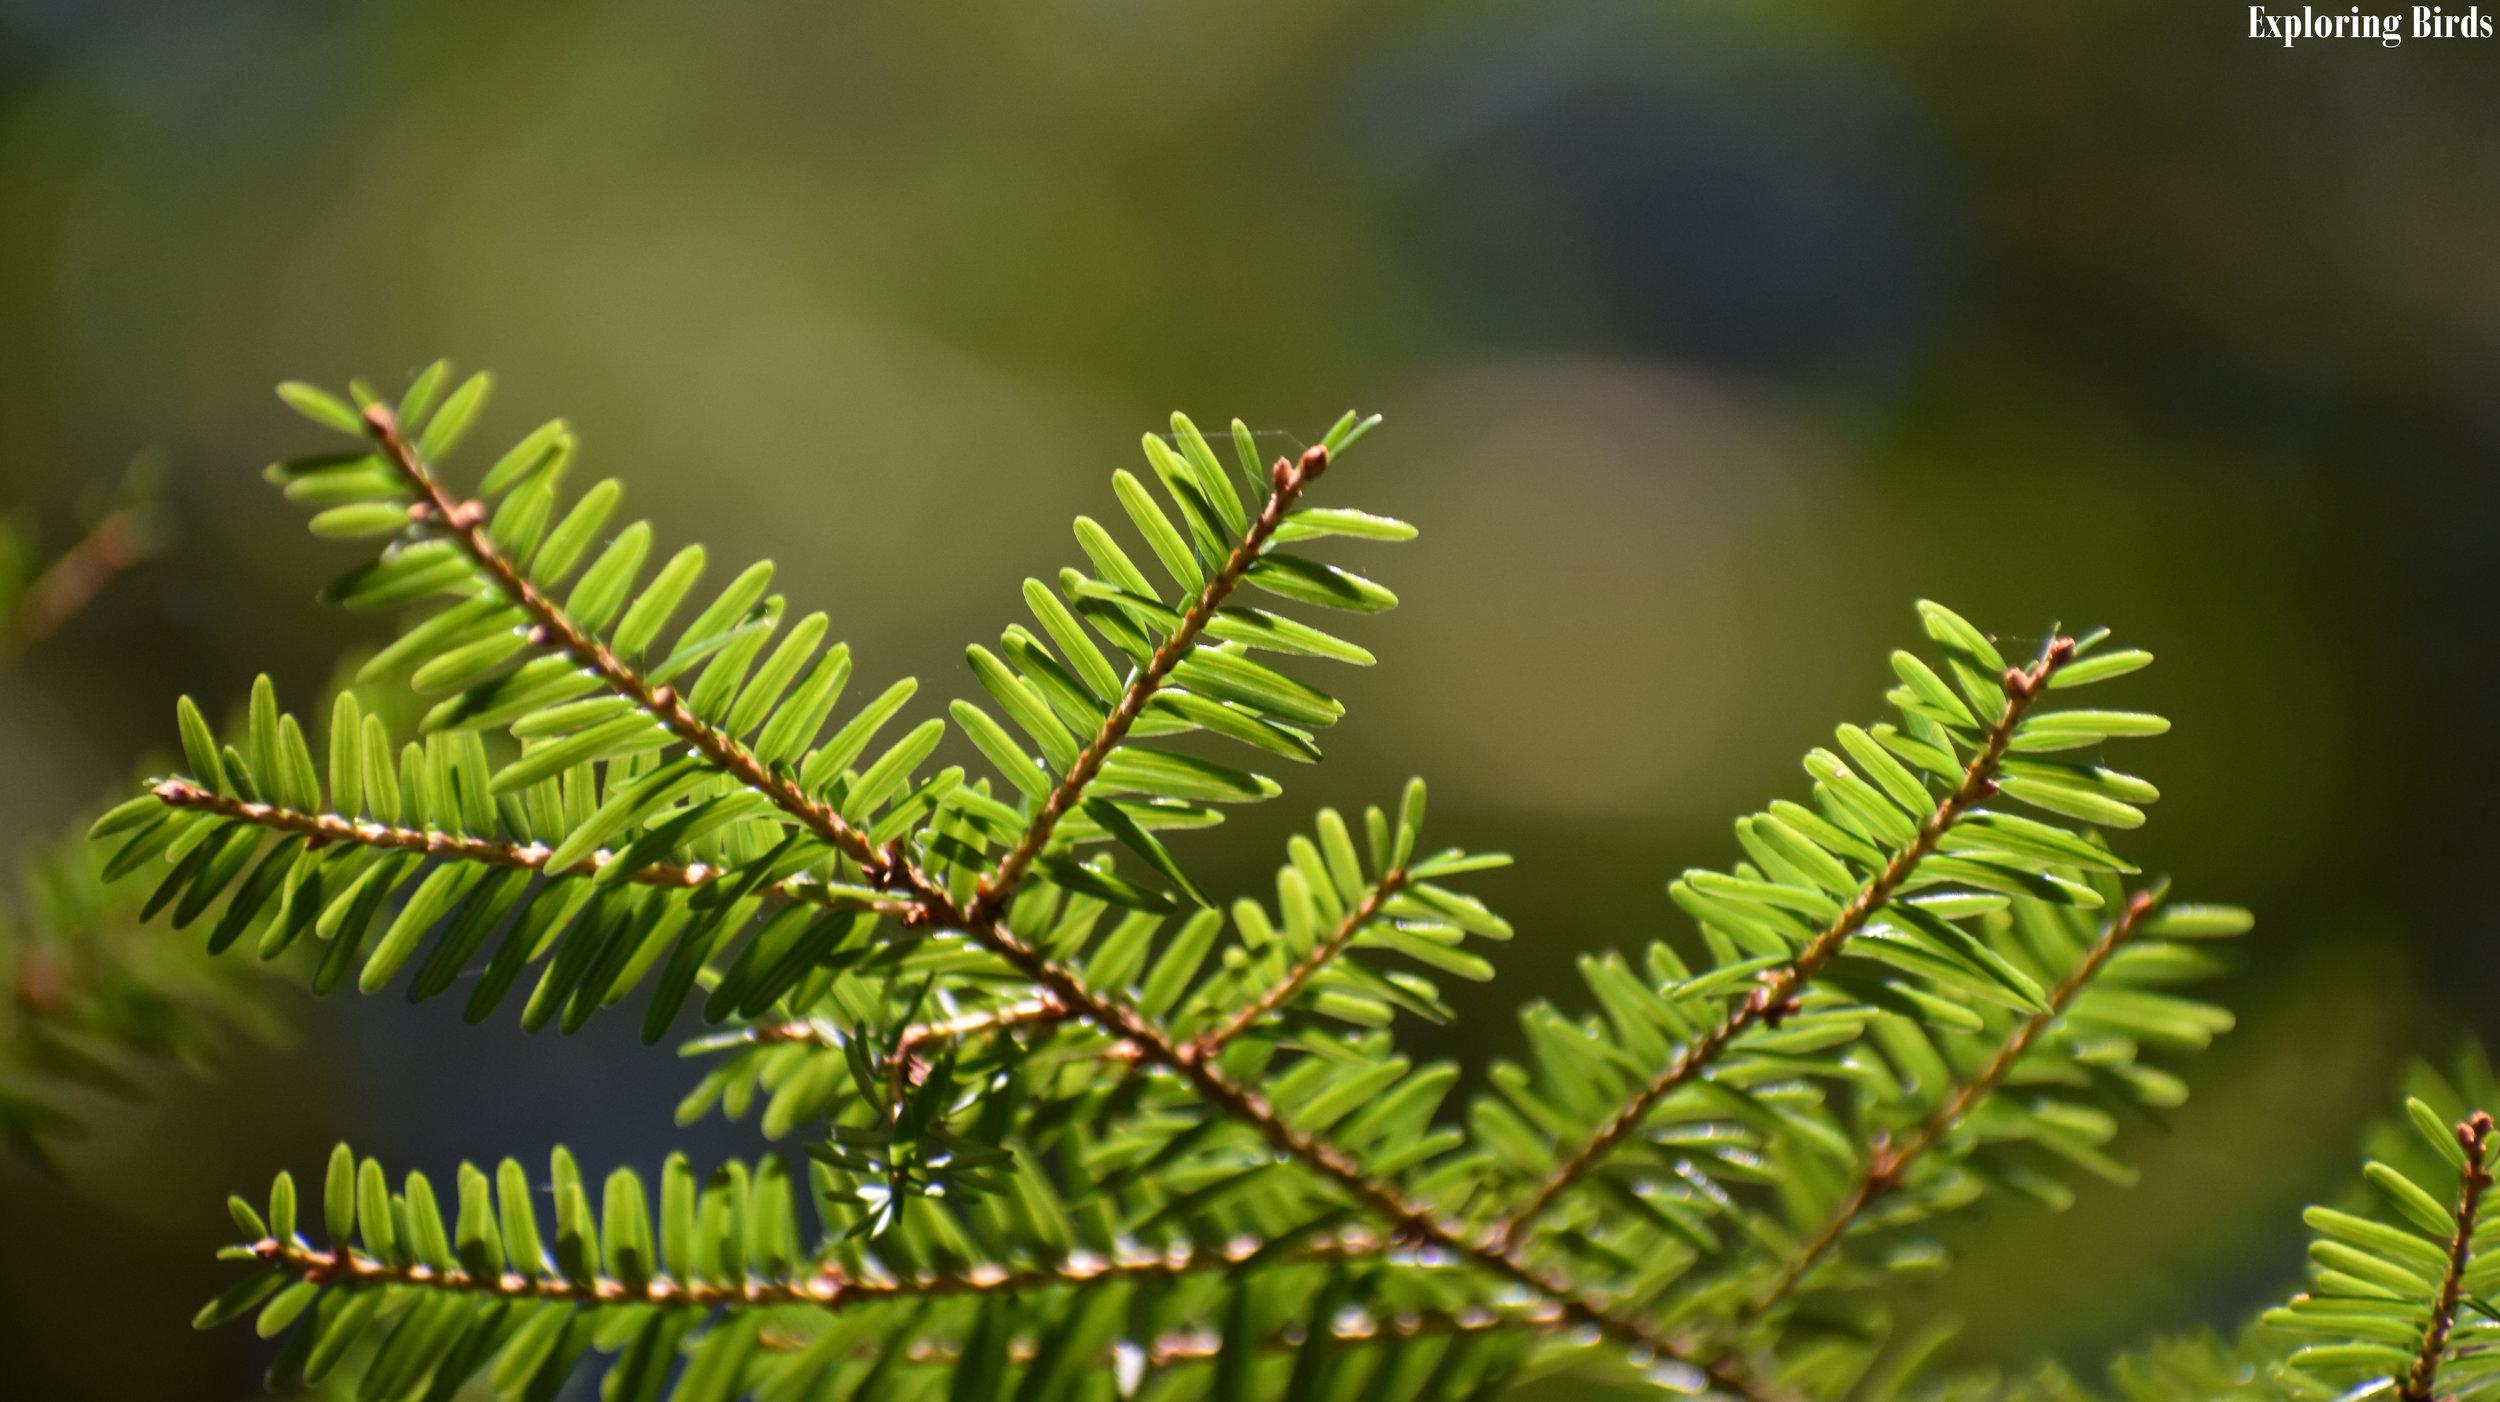 Eastern Hemlock branch